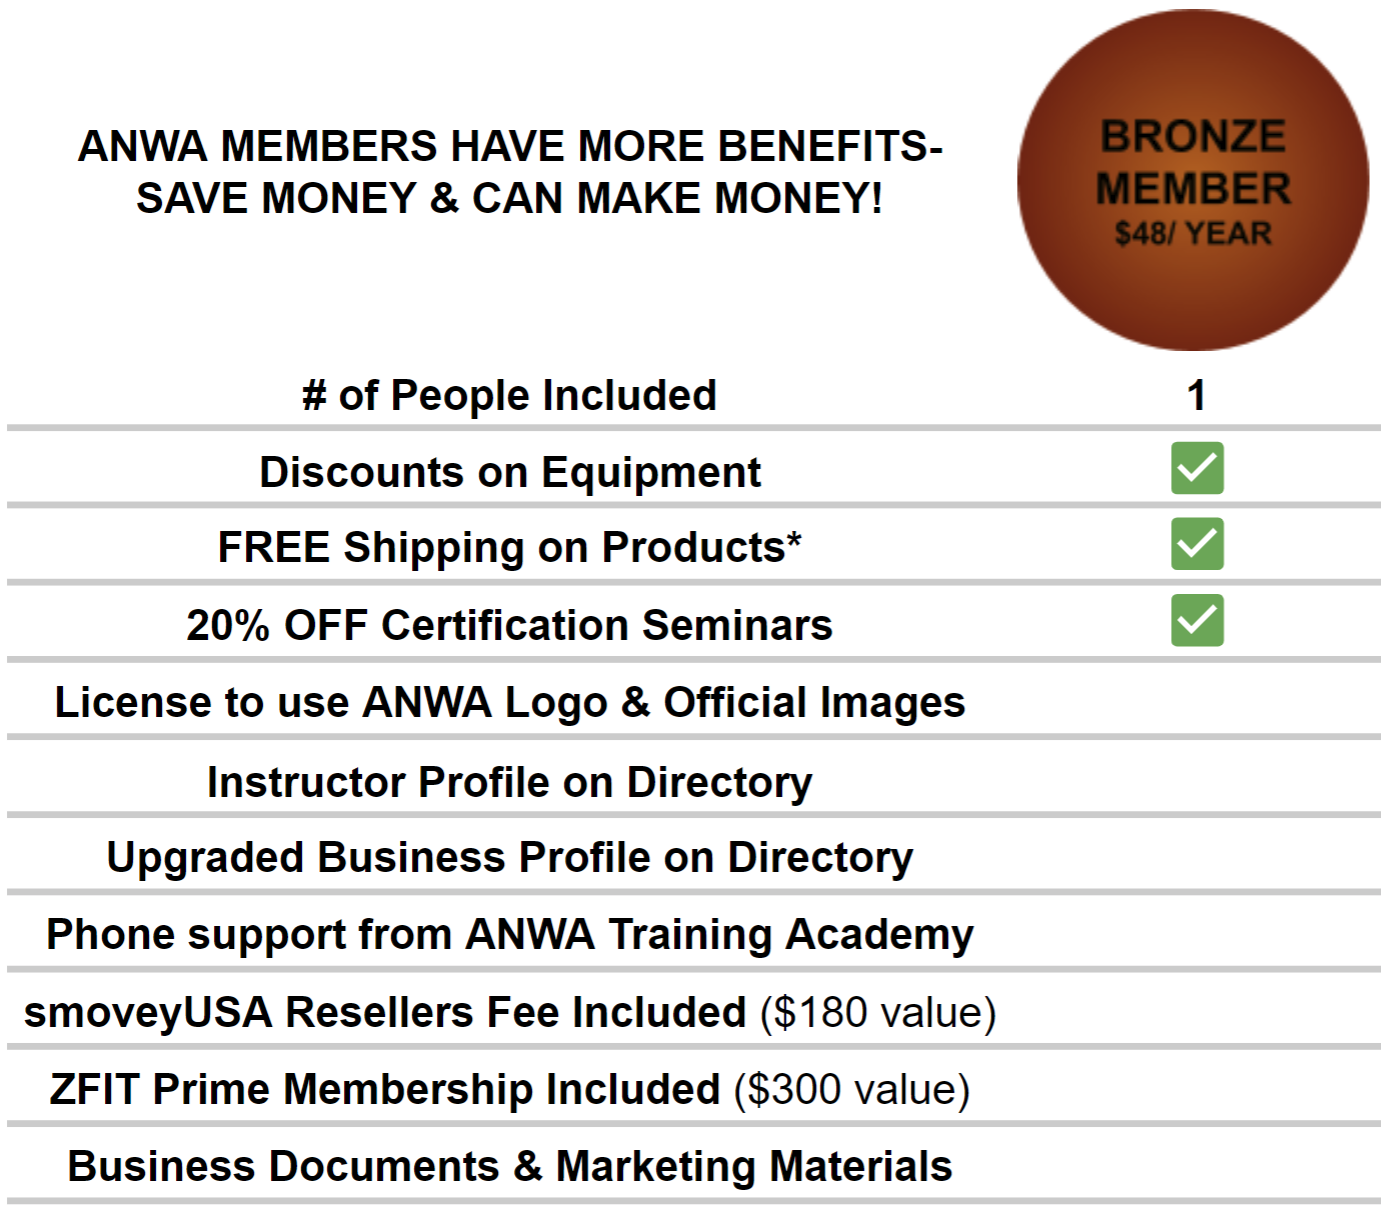 Nordic Walking Online- ANWA Membership Package- Bronze Member